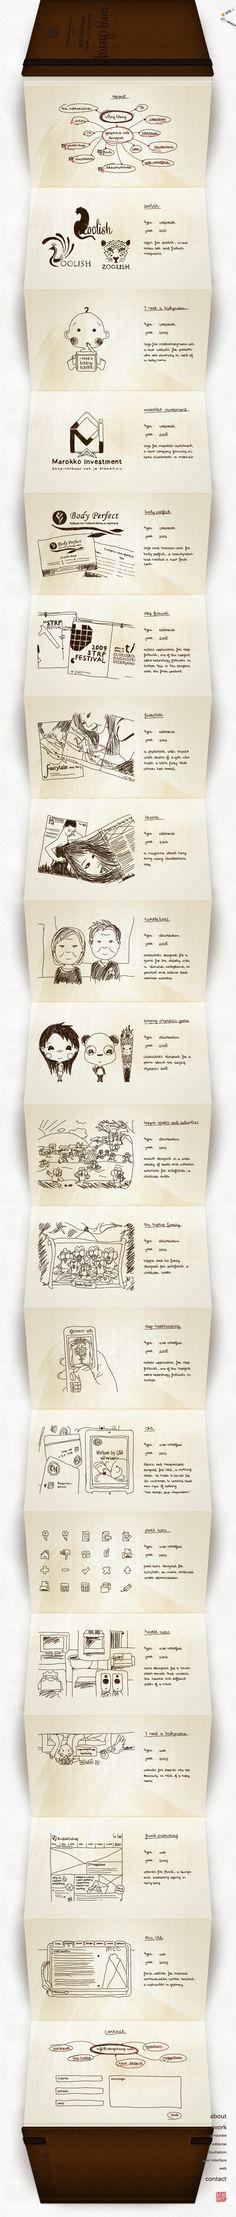 Unique Web Design, Wing Cheng via @cairulin #WebDesign #Design